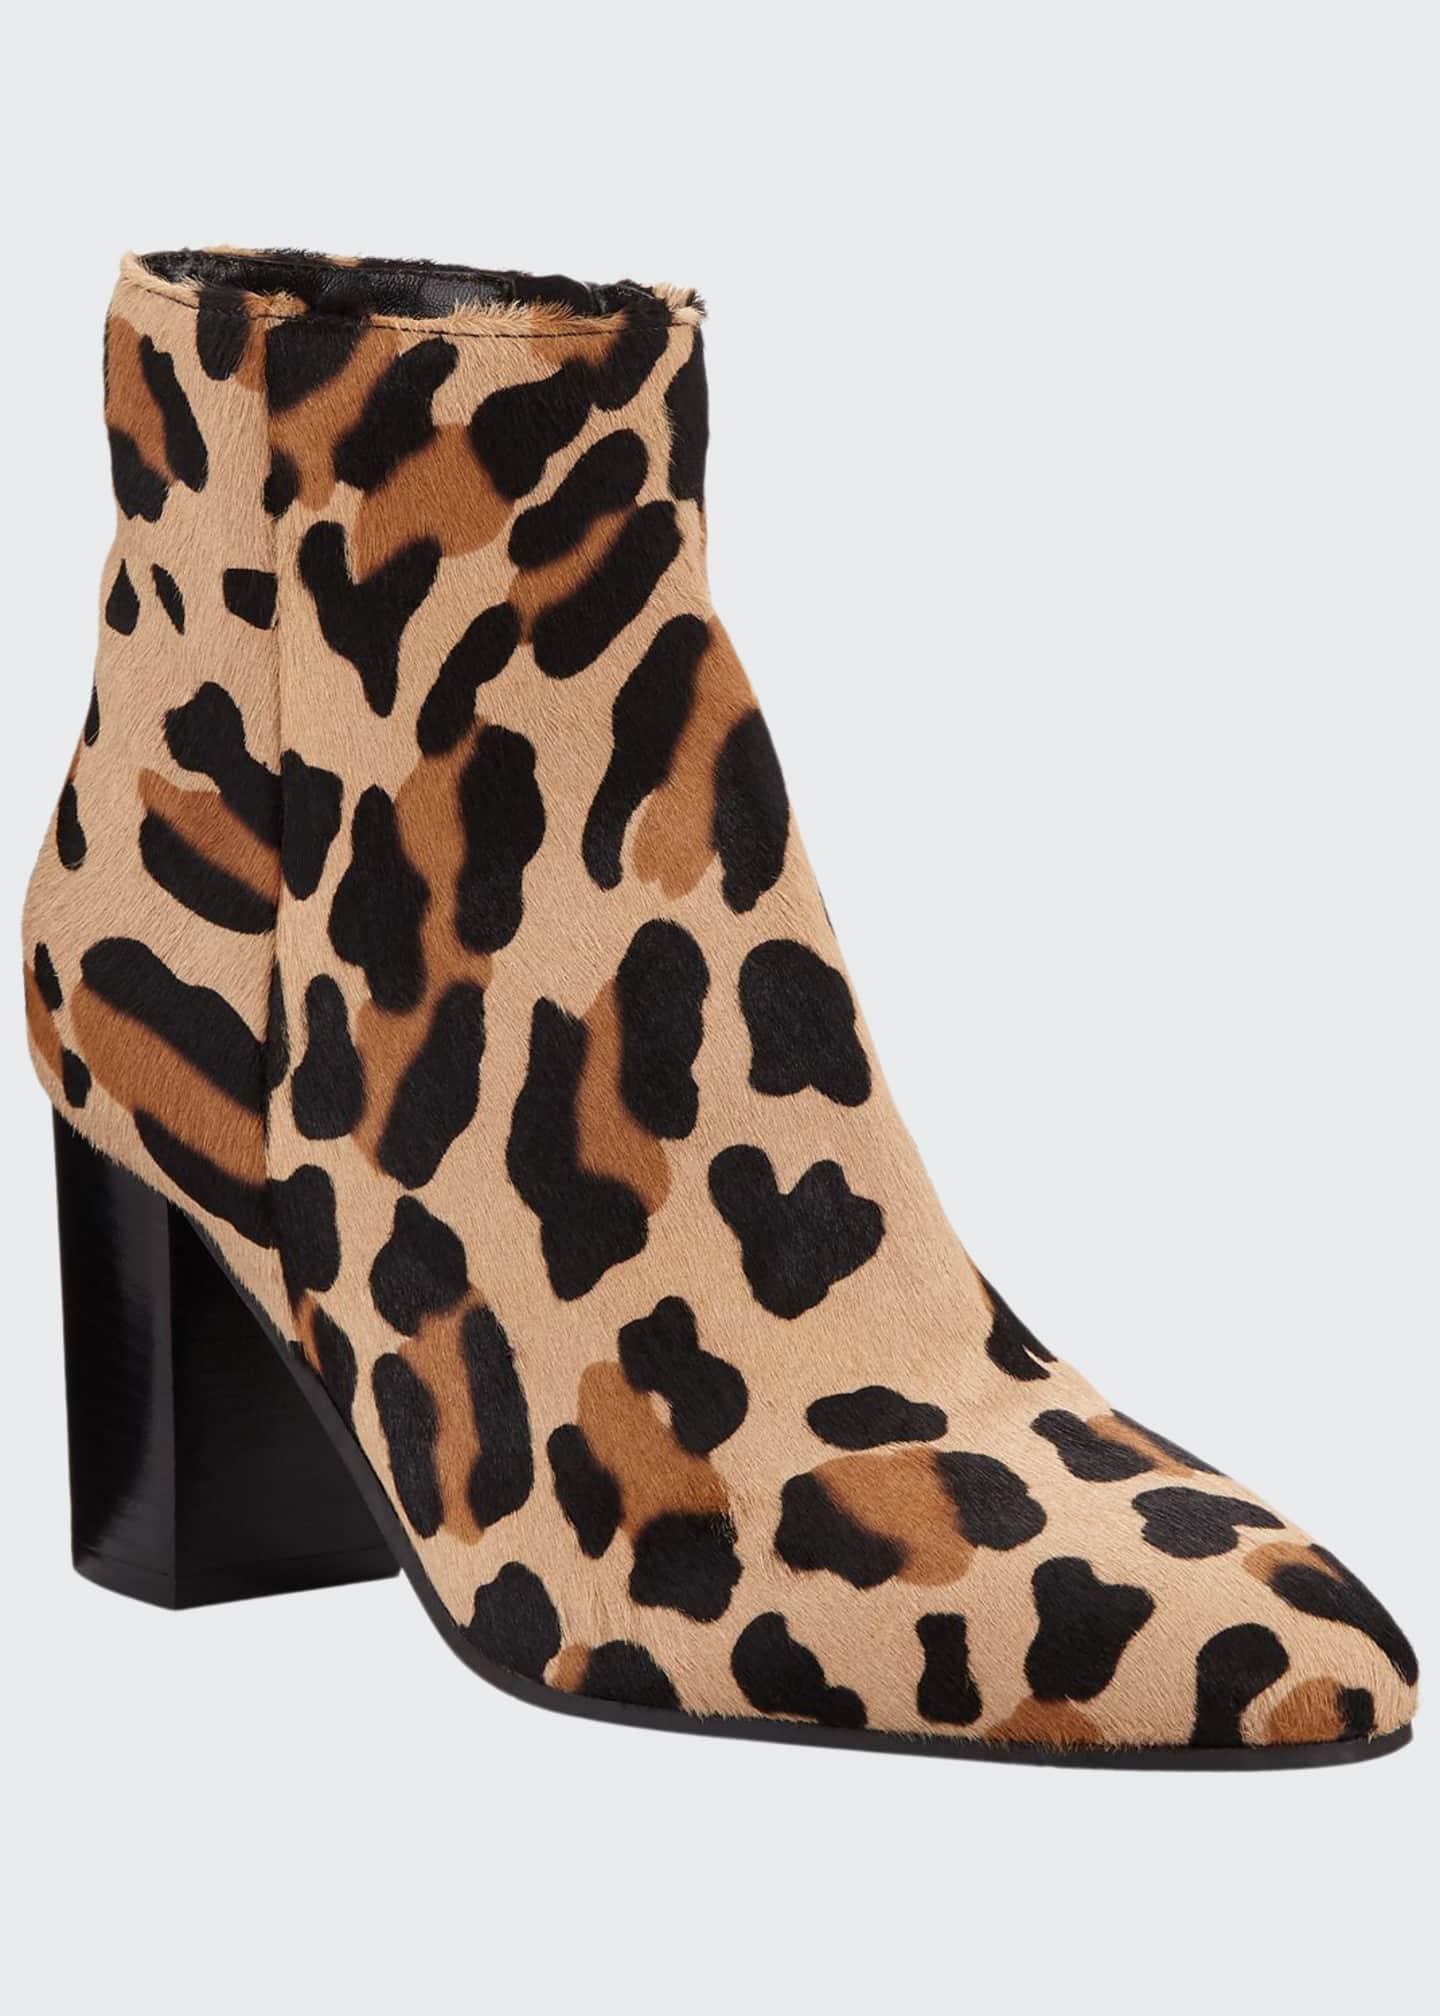 Aquatalia Florita Leopard-Print Calf Hair Booties